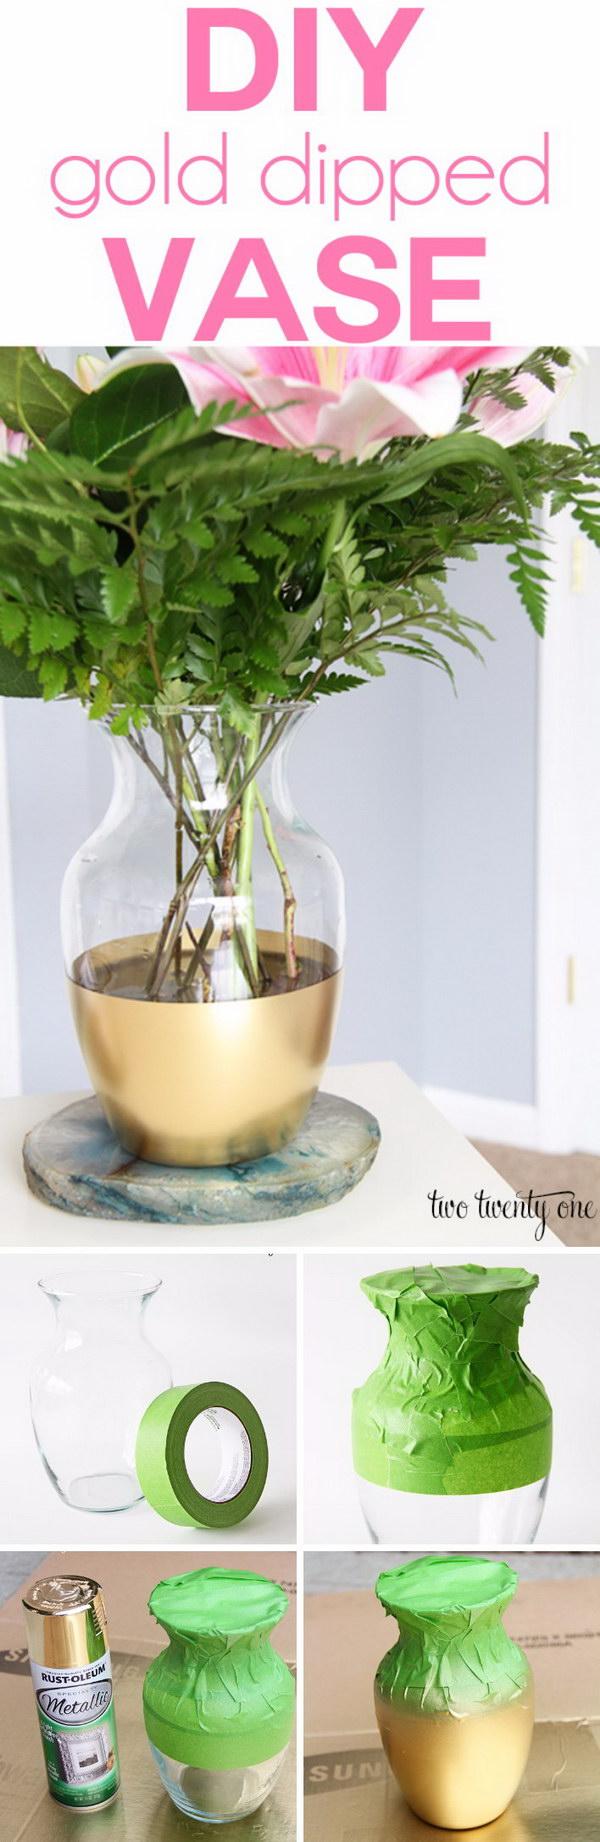 DIY Gold Dipped Vase.